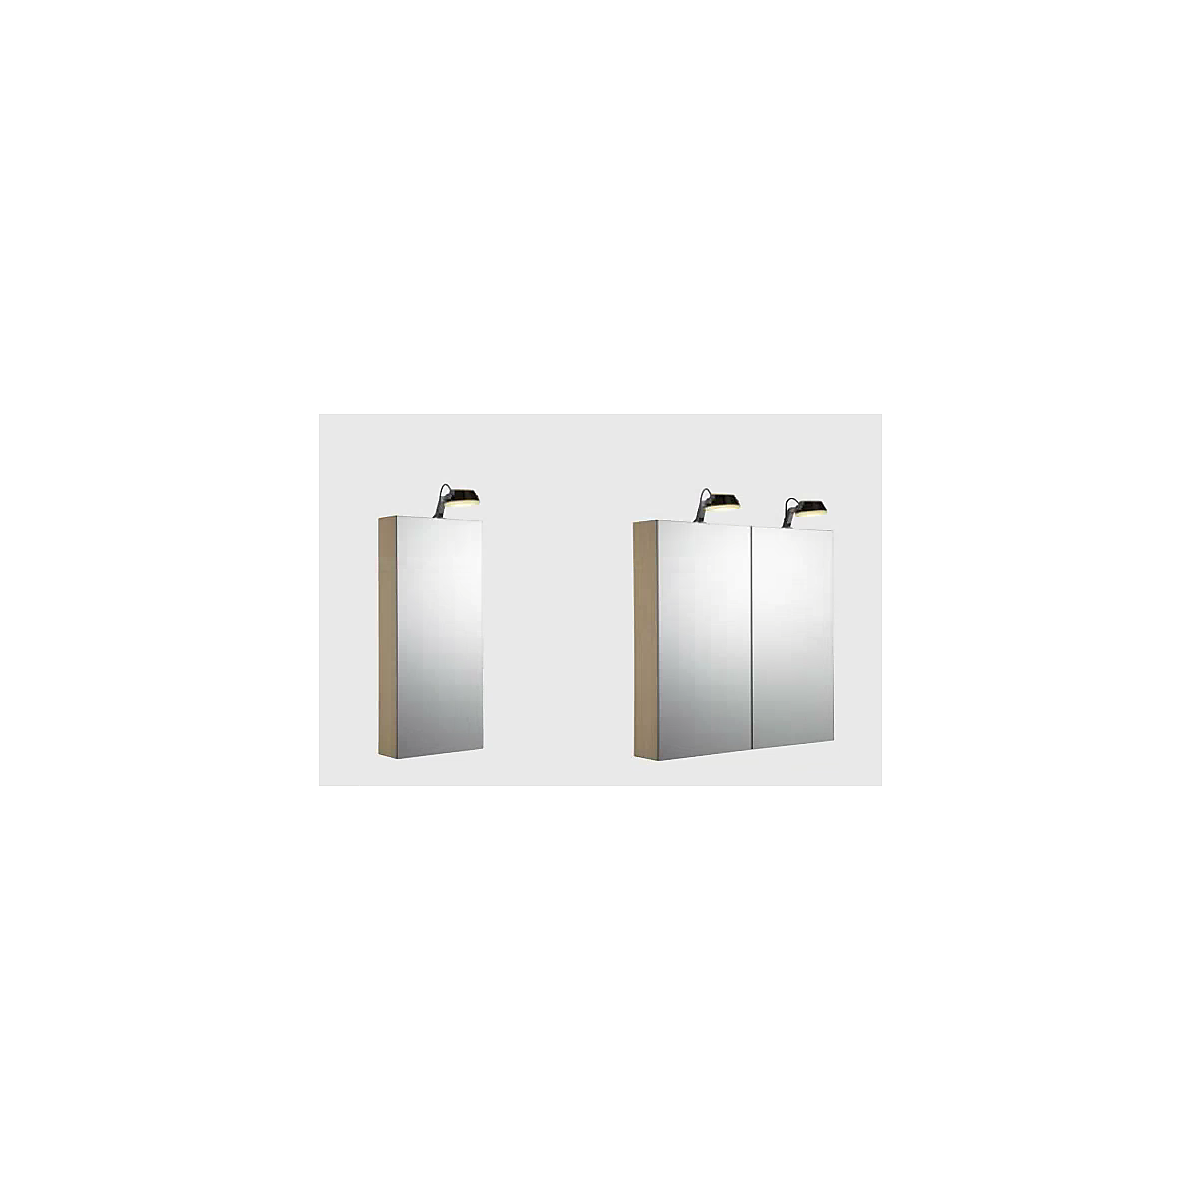 2805144378U   Dansani Calidris Spegelskåp m/ belysning 600x800 mm, m/underlight, Ljus Ek